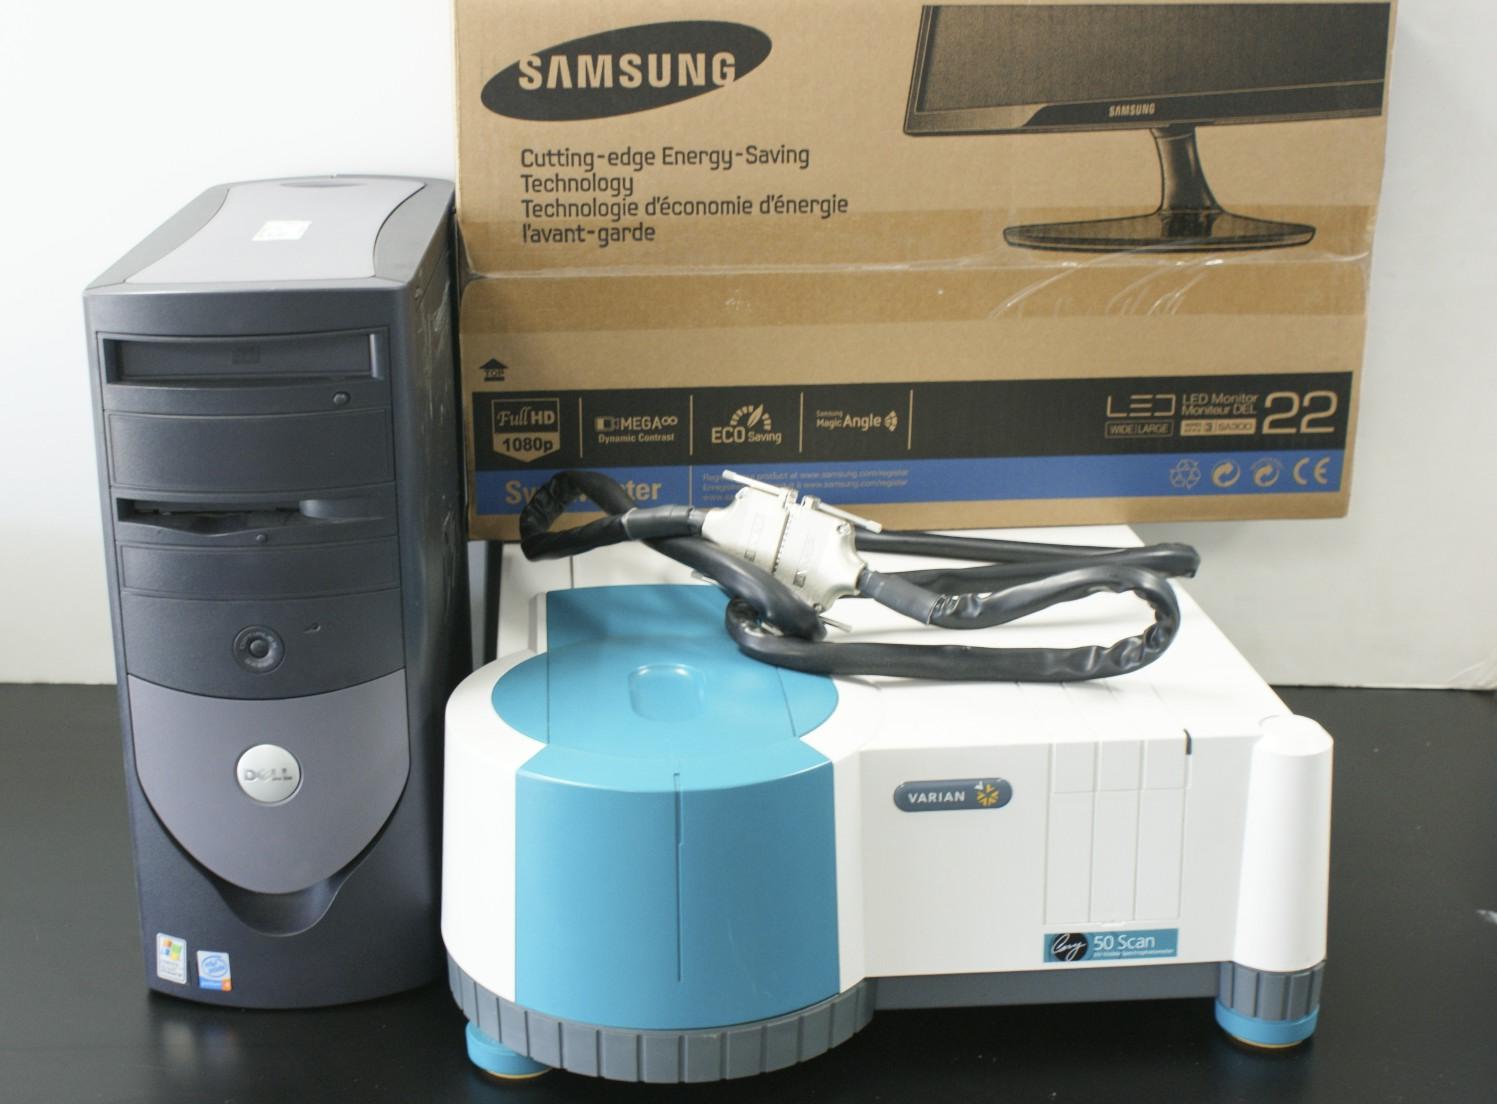 Varian CARY 50 SCAN Agilent Varian CARY 50 Scan UV-VIS Spectrophotometer Varian Spectrophotometer